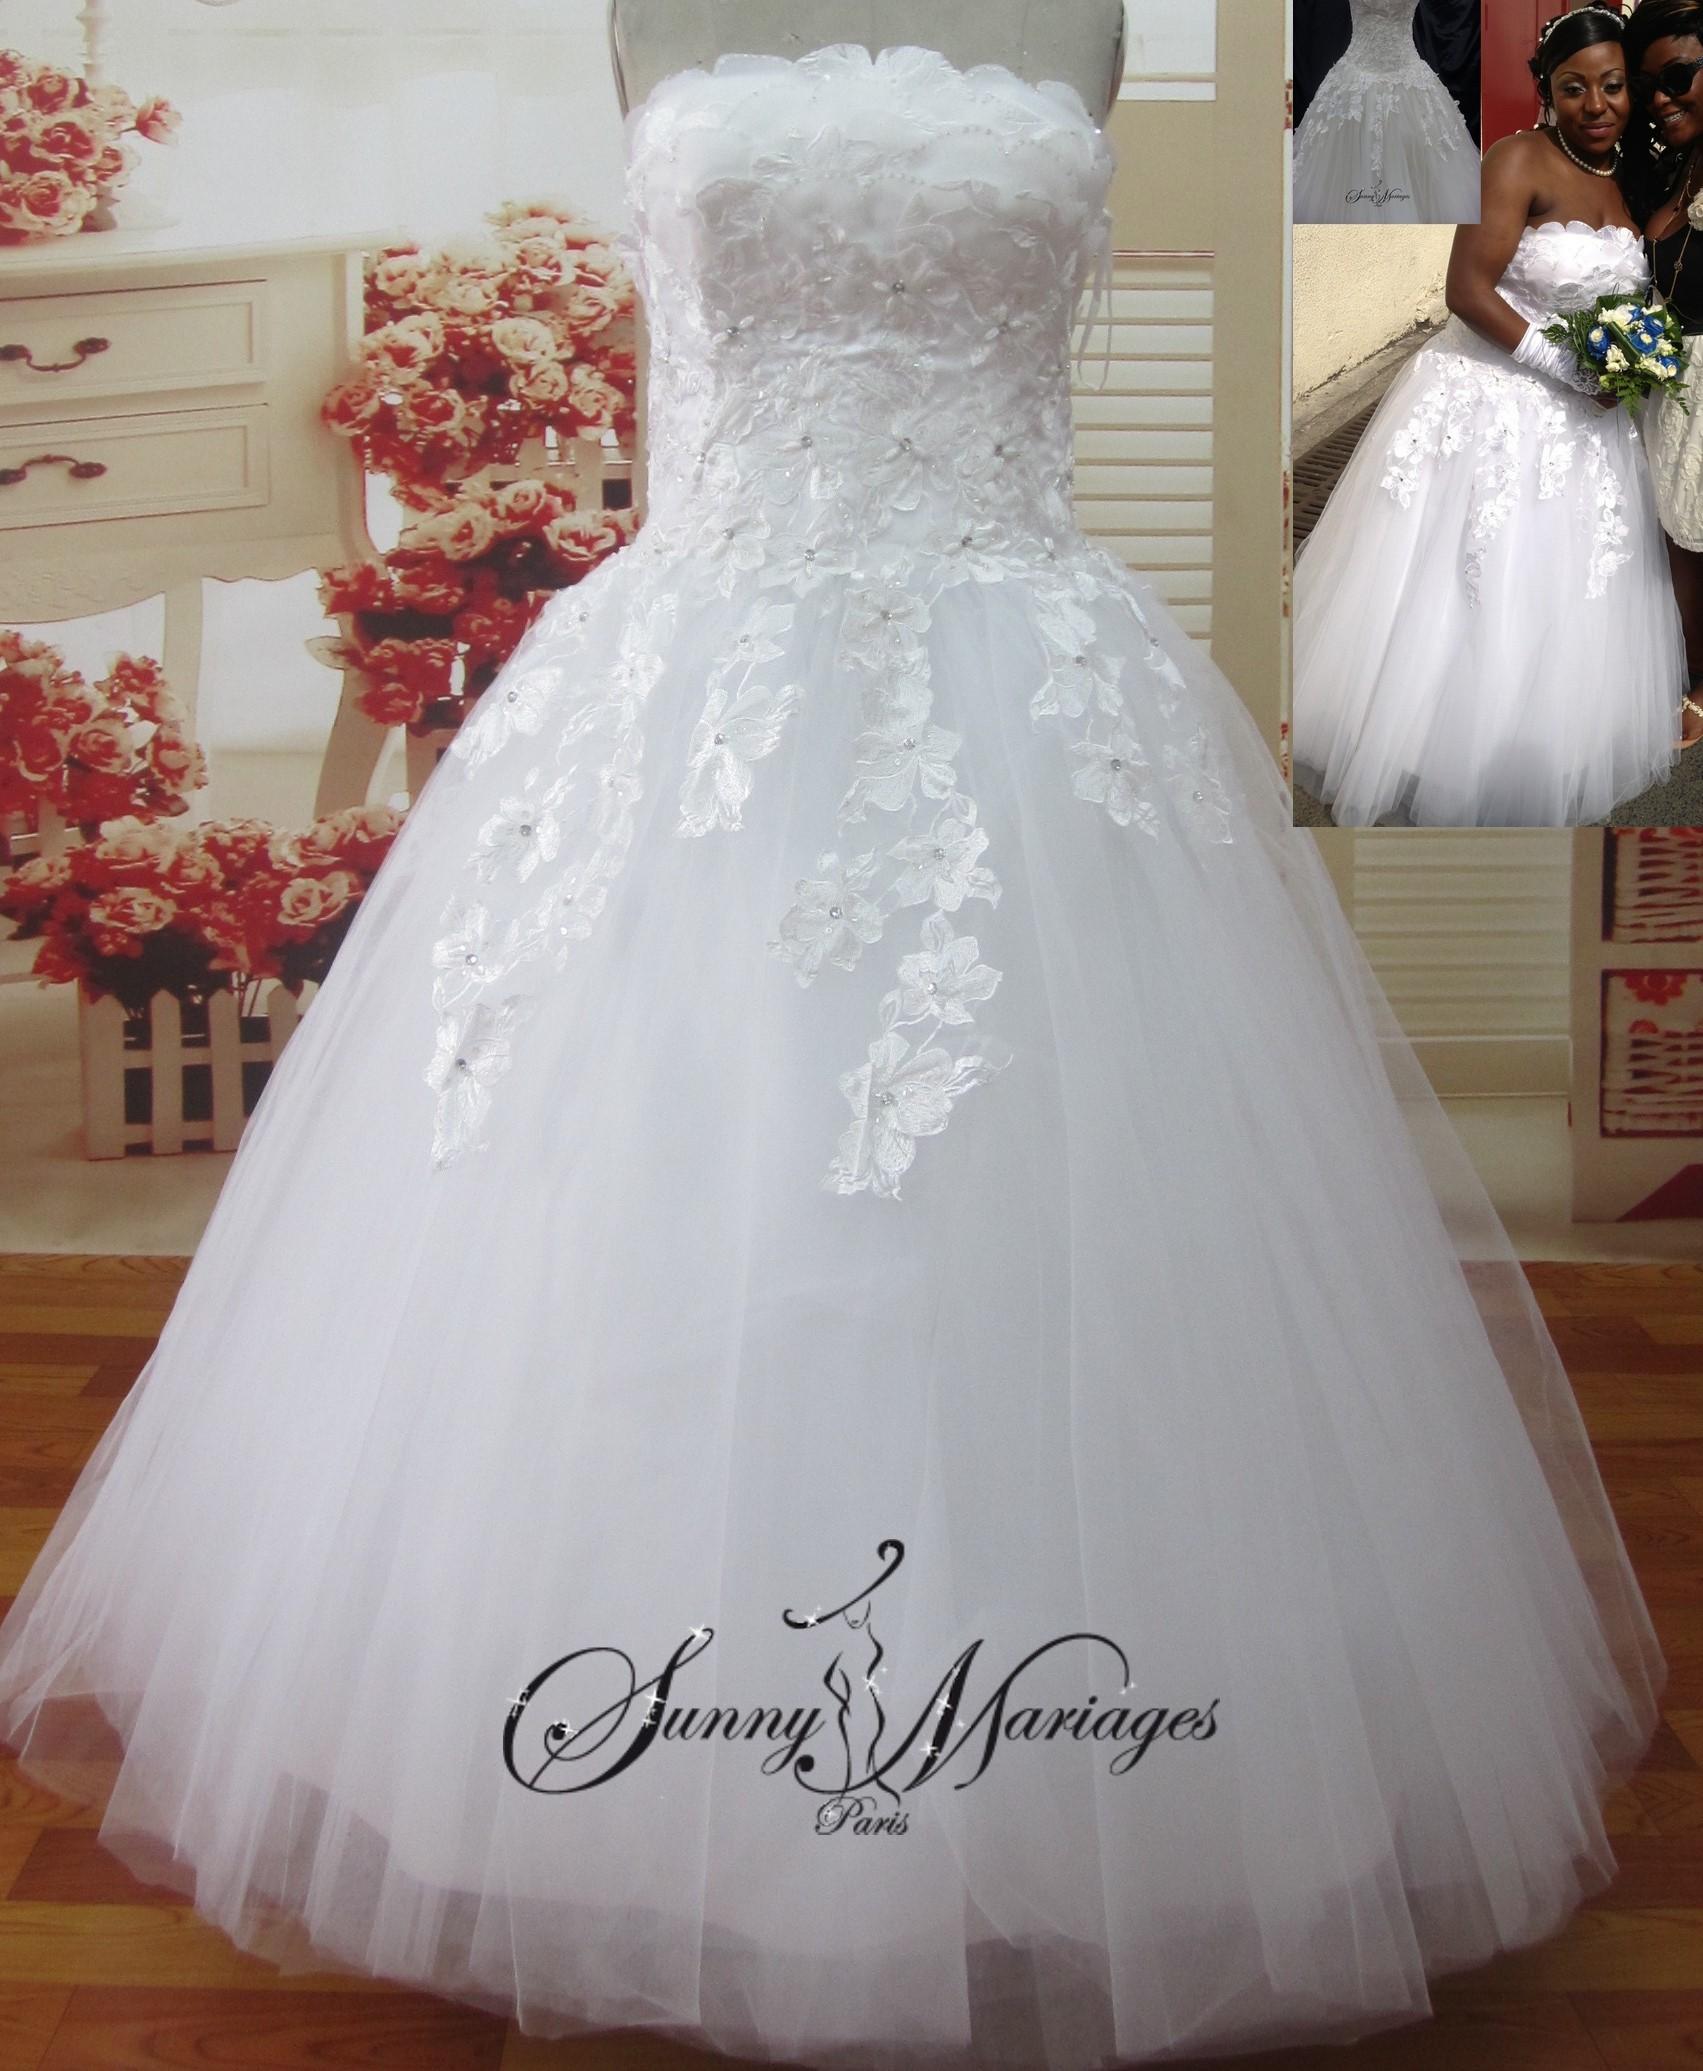 robe de mariee en tulle robe de mariee jupe danseuse robe de mariee couleur site francais de. Black Bedroom Furniture Sets. Home Design Ideas